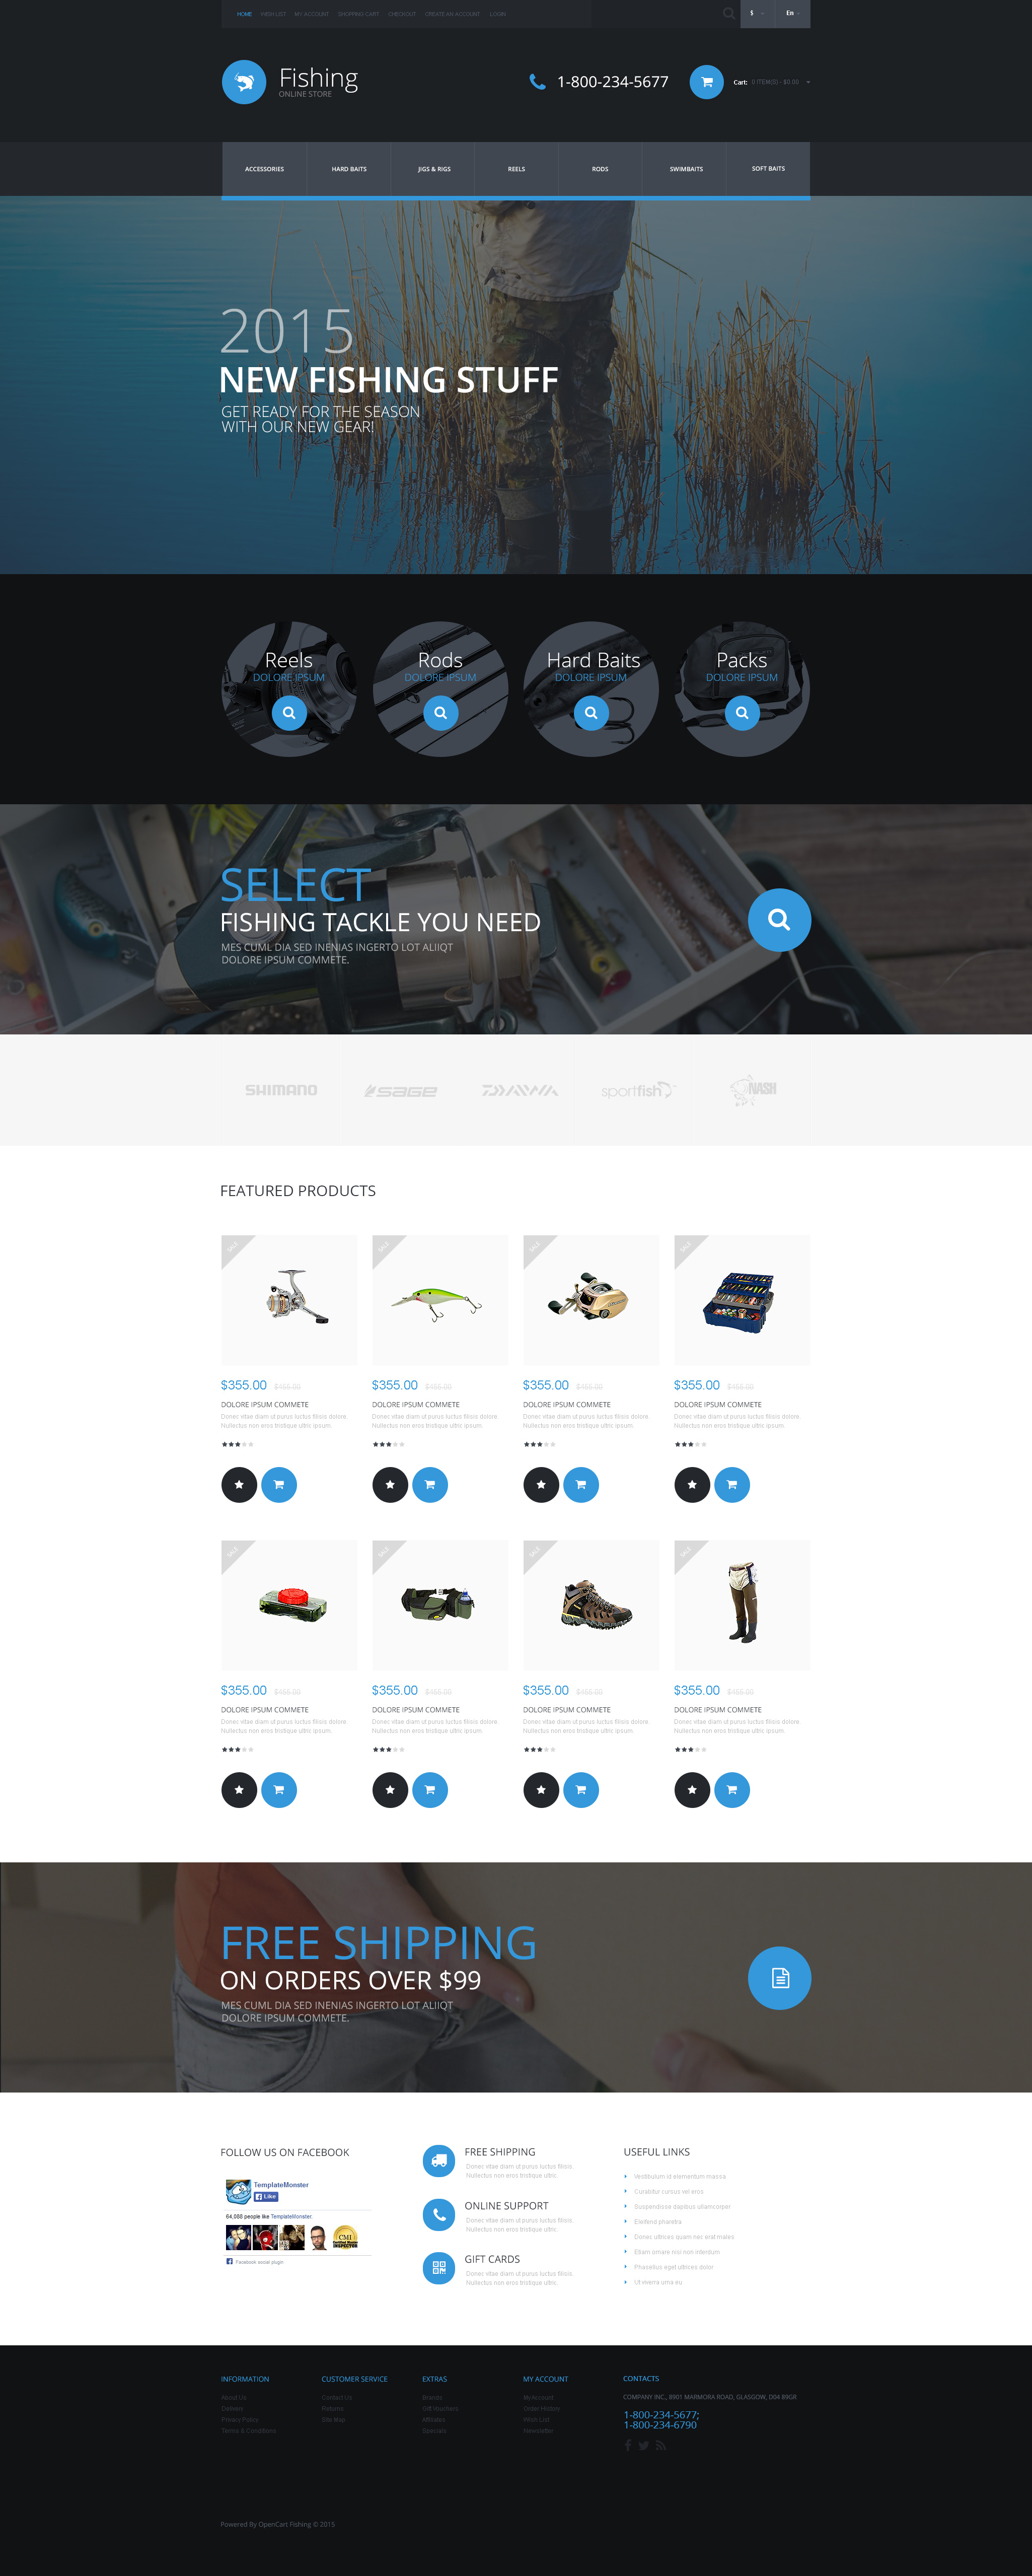 """Fishing Equipment Store"" Responsive OpenCart Template №53849 - screenshot"